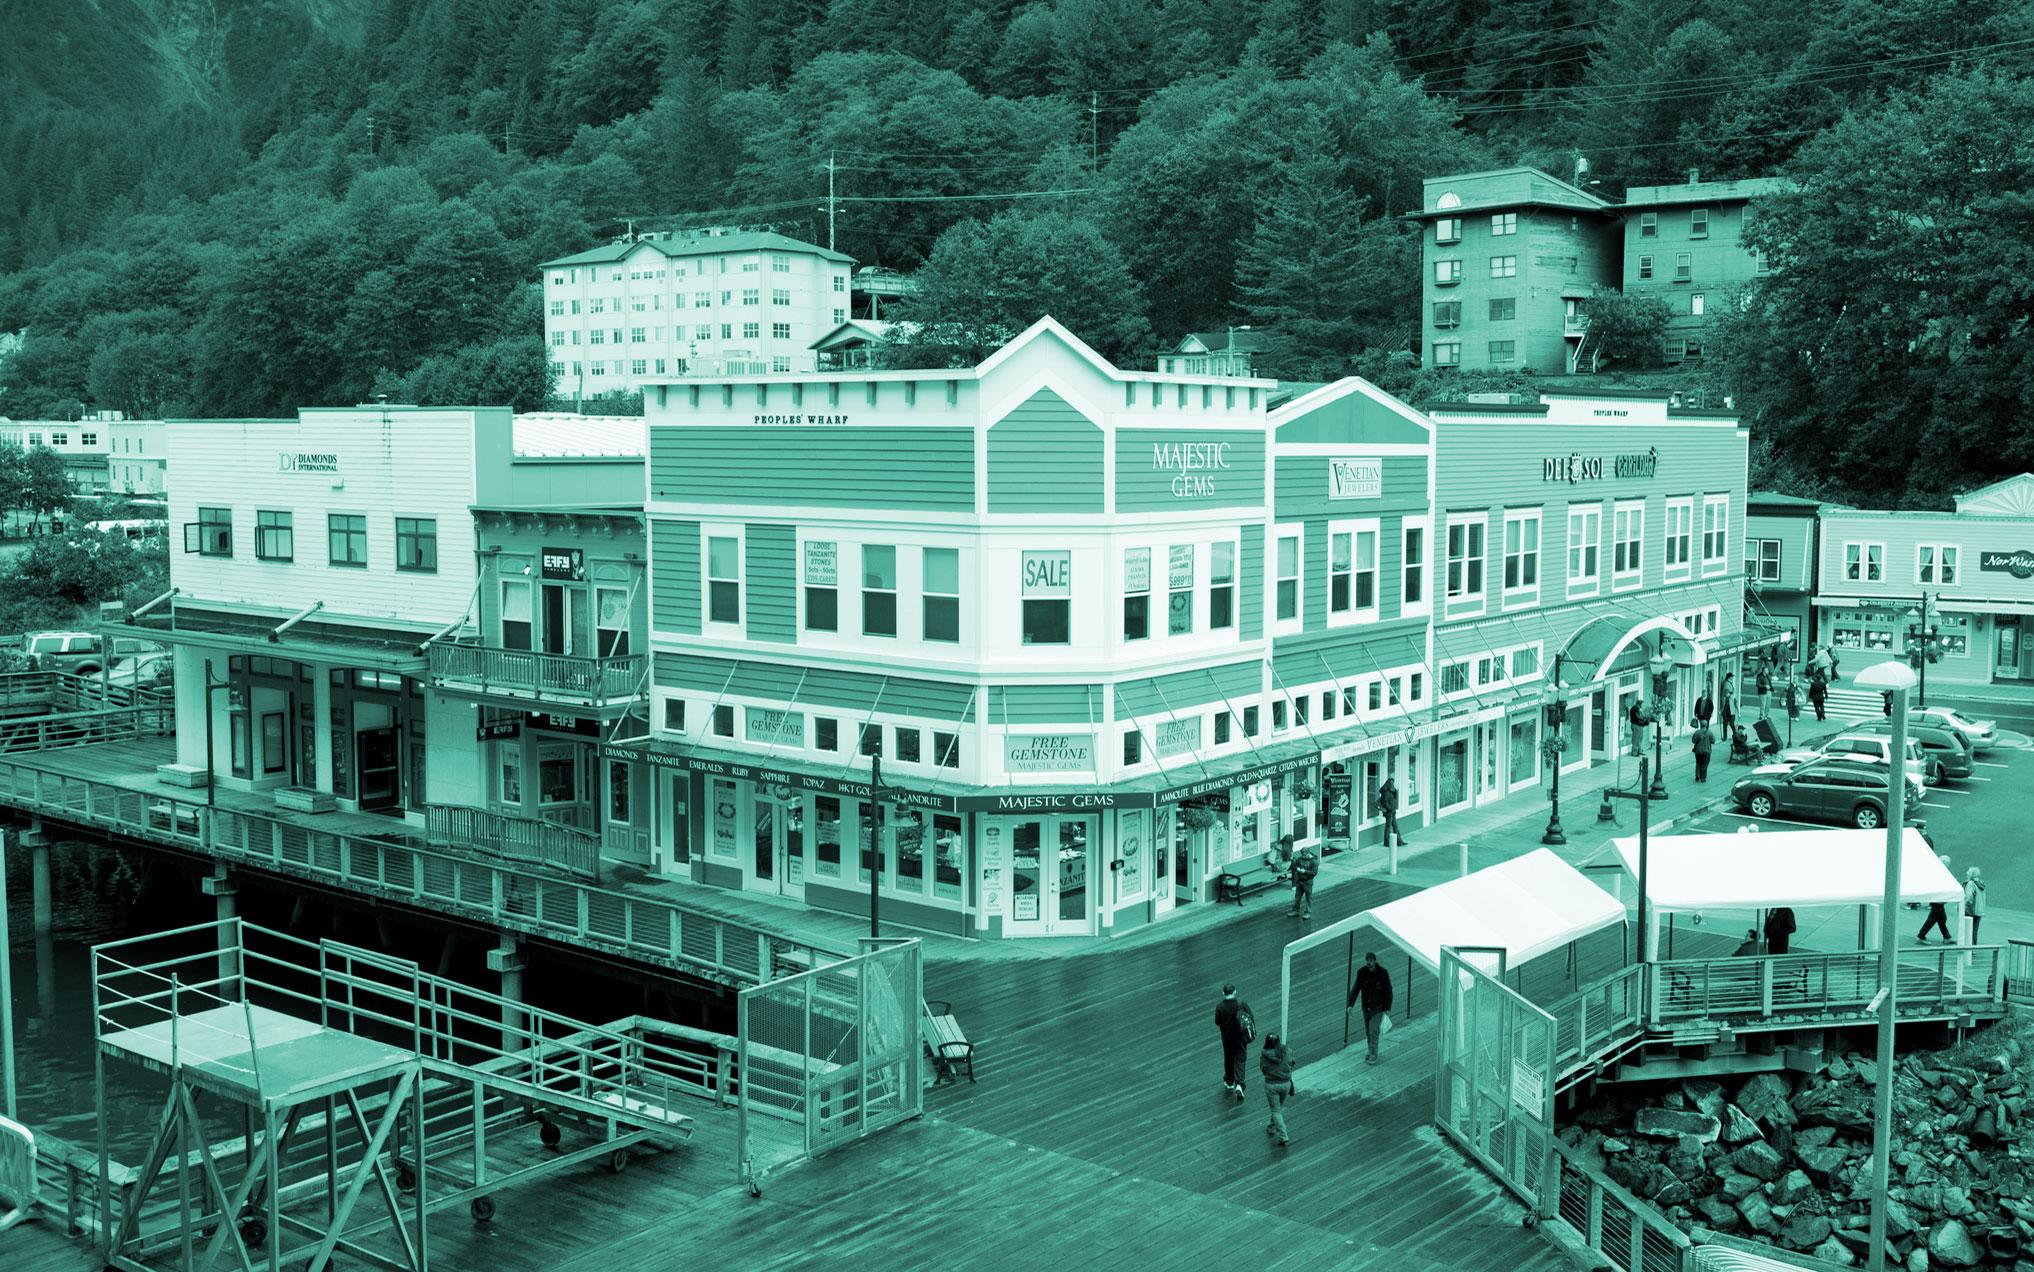 Alaska's Two New Cannabis Regulators Take Aim at On-Site Consumption